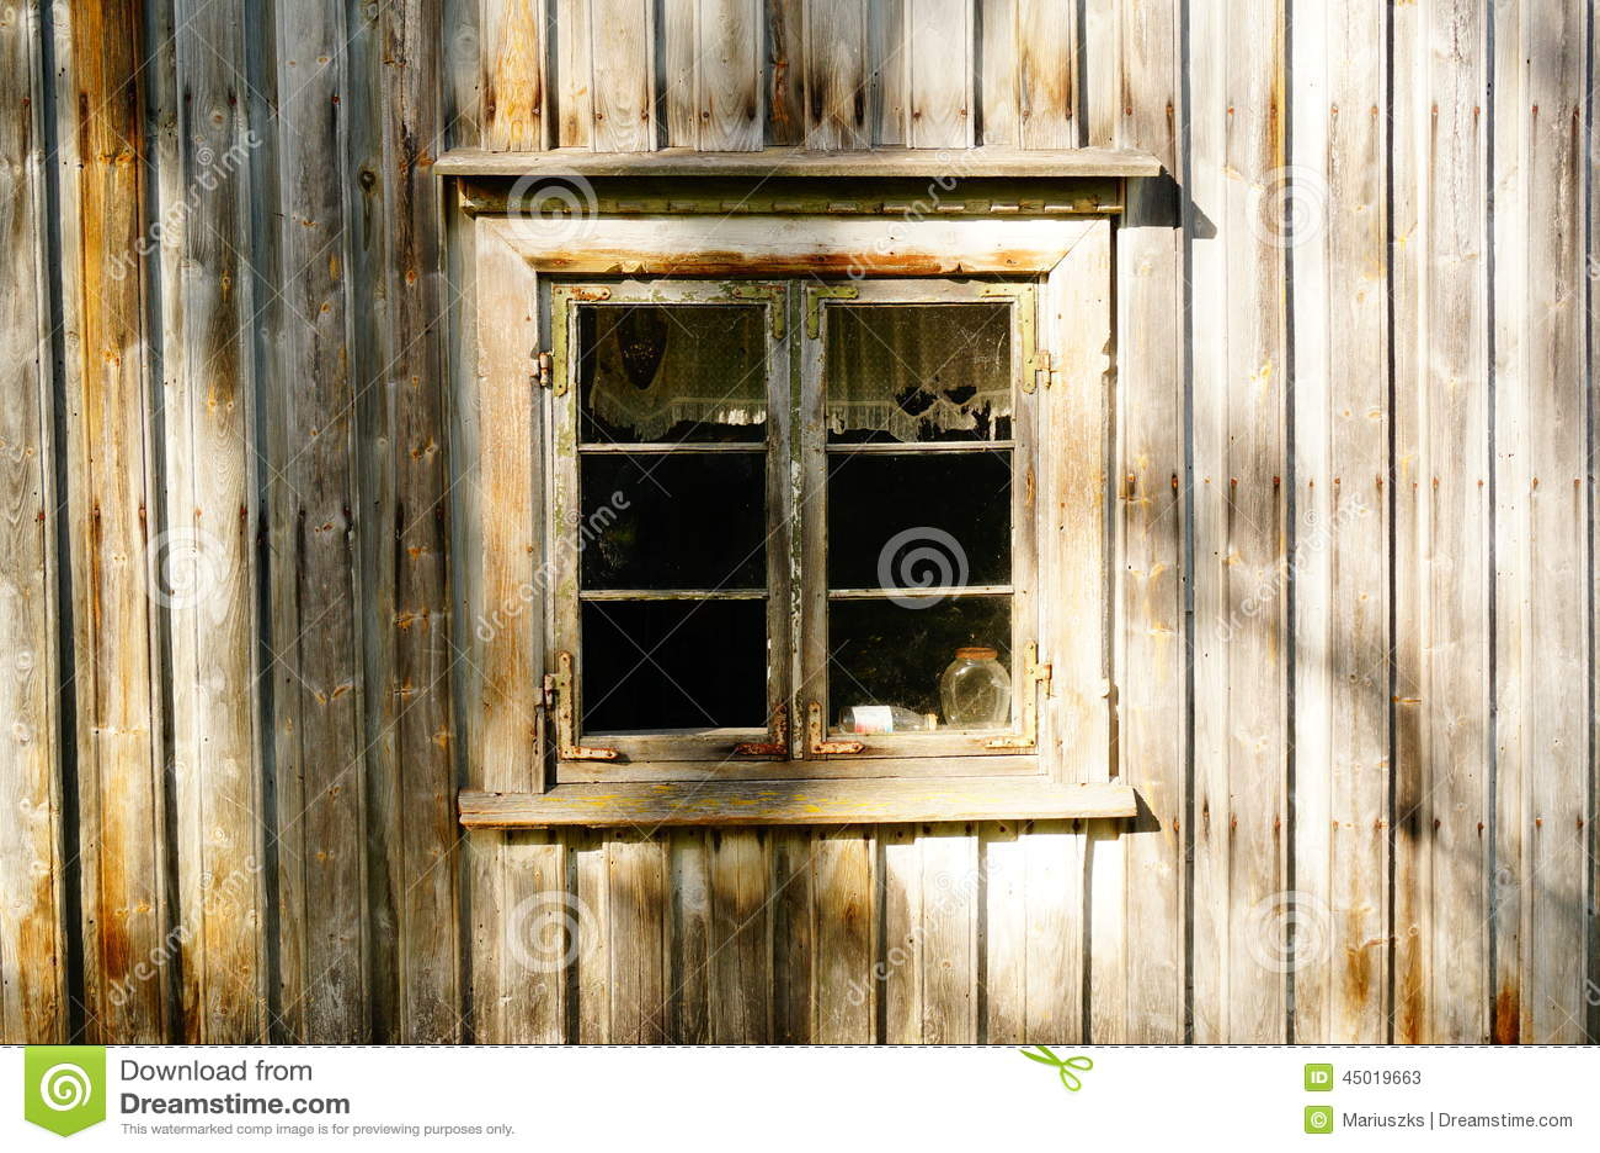 Window wood in old farm house, Norway